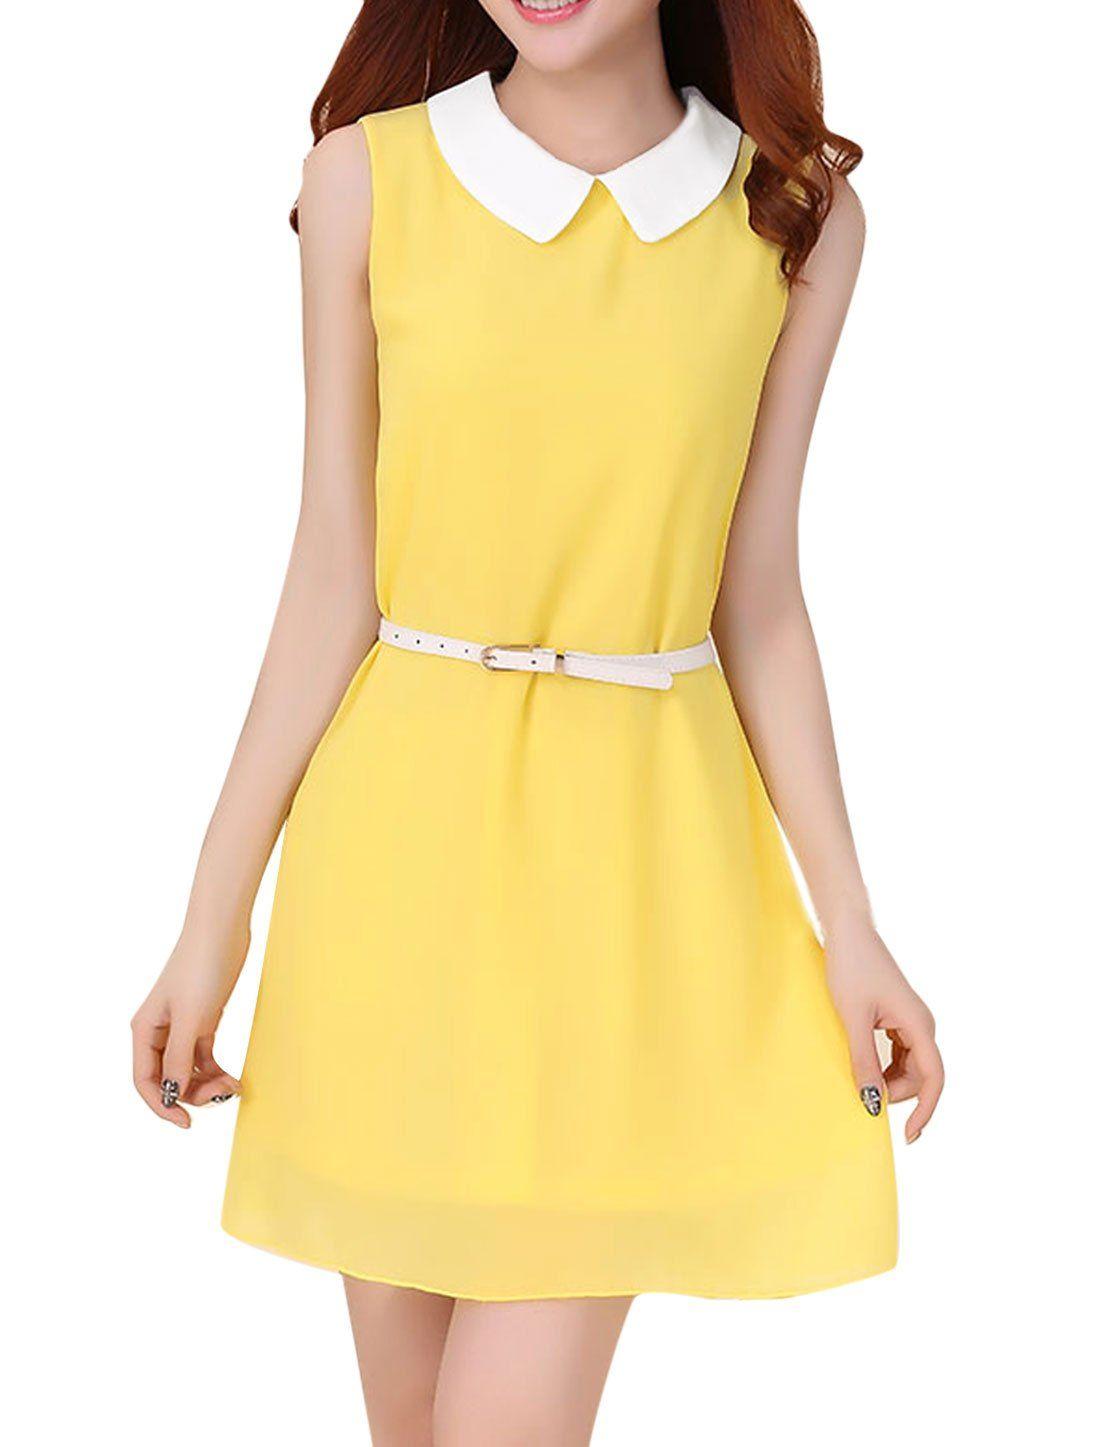 Honey Lemon dress. | geeky | Dresses, Fashion, Disney ...